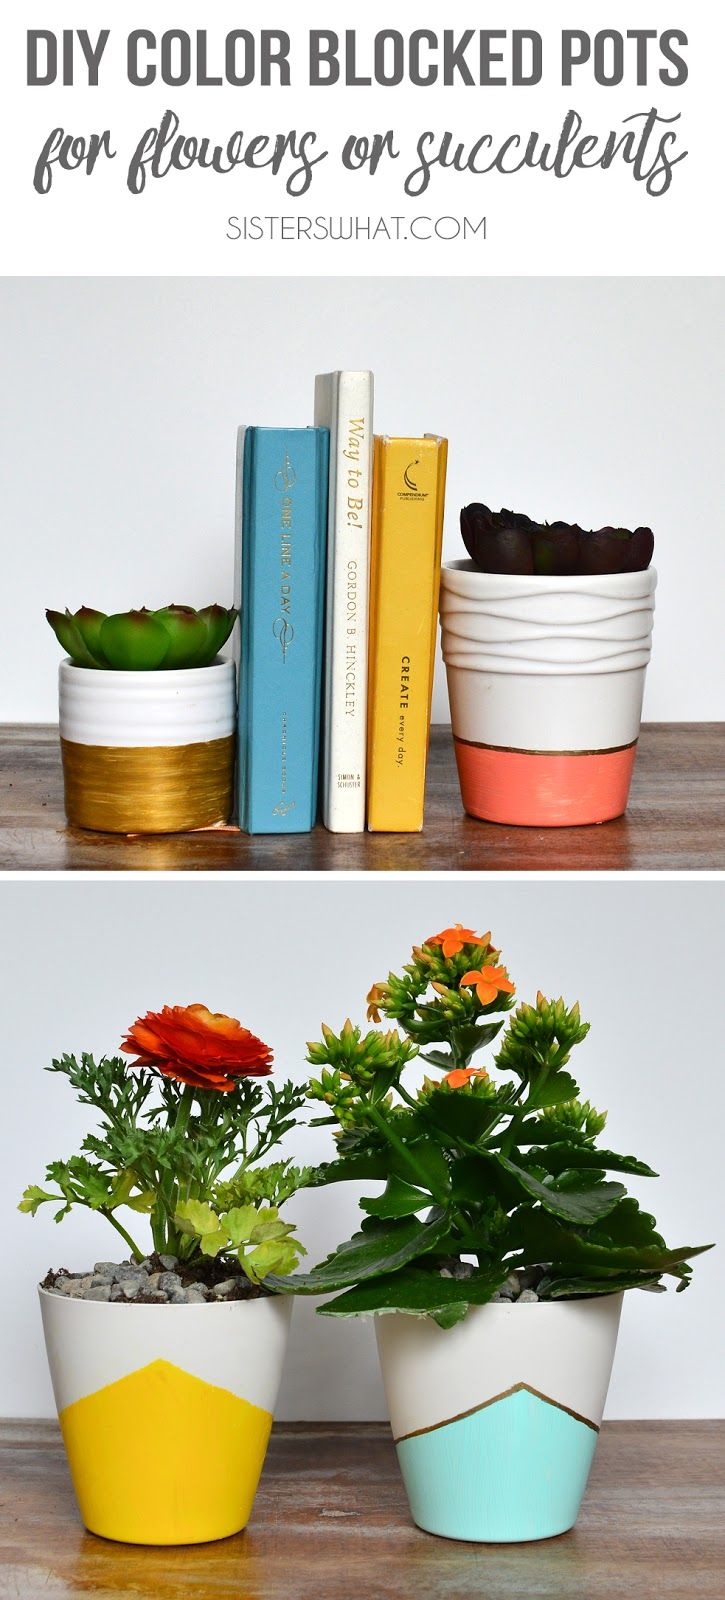 Paint some plastic pots to add some color to home decor color blocked pots succulents or flower pots